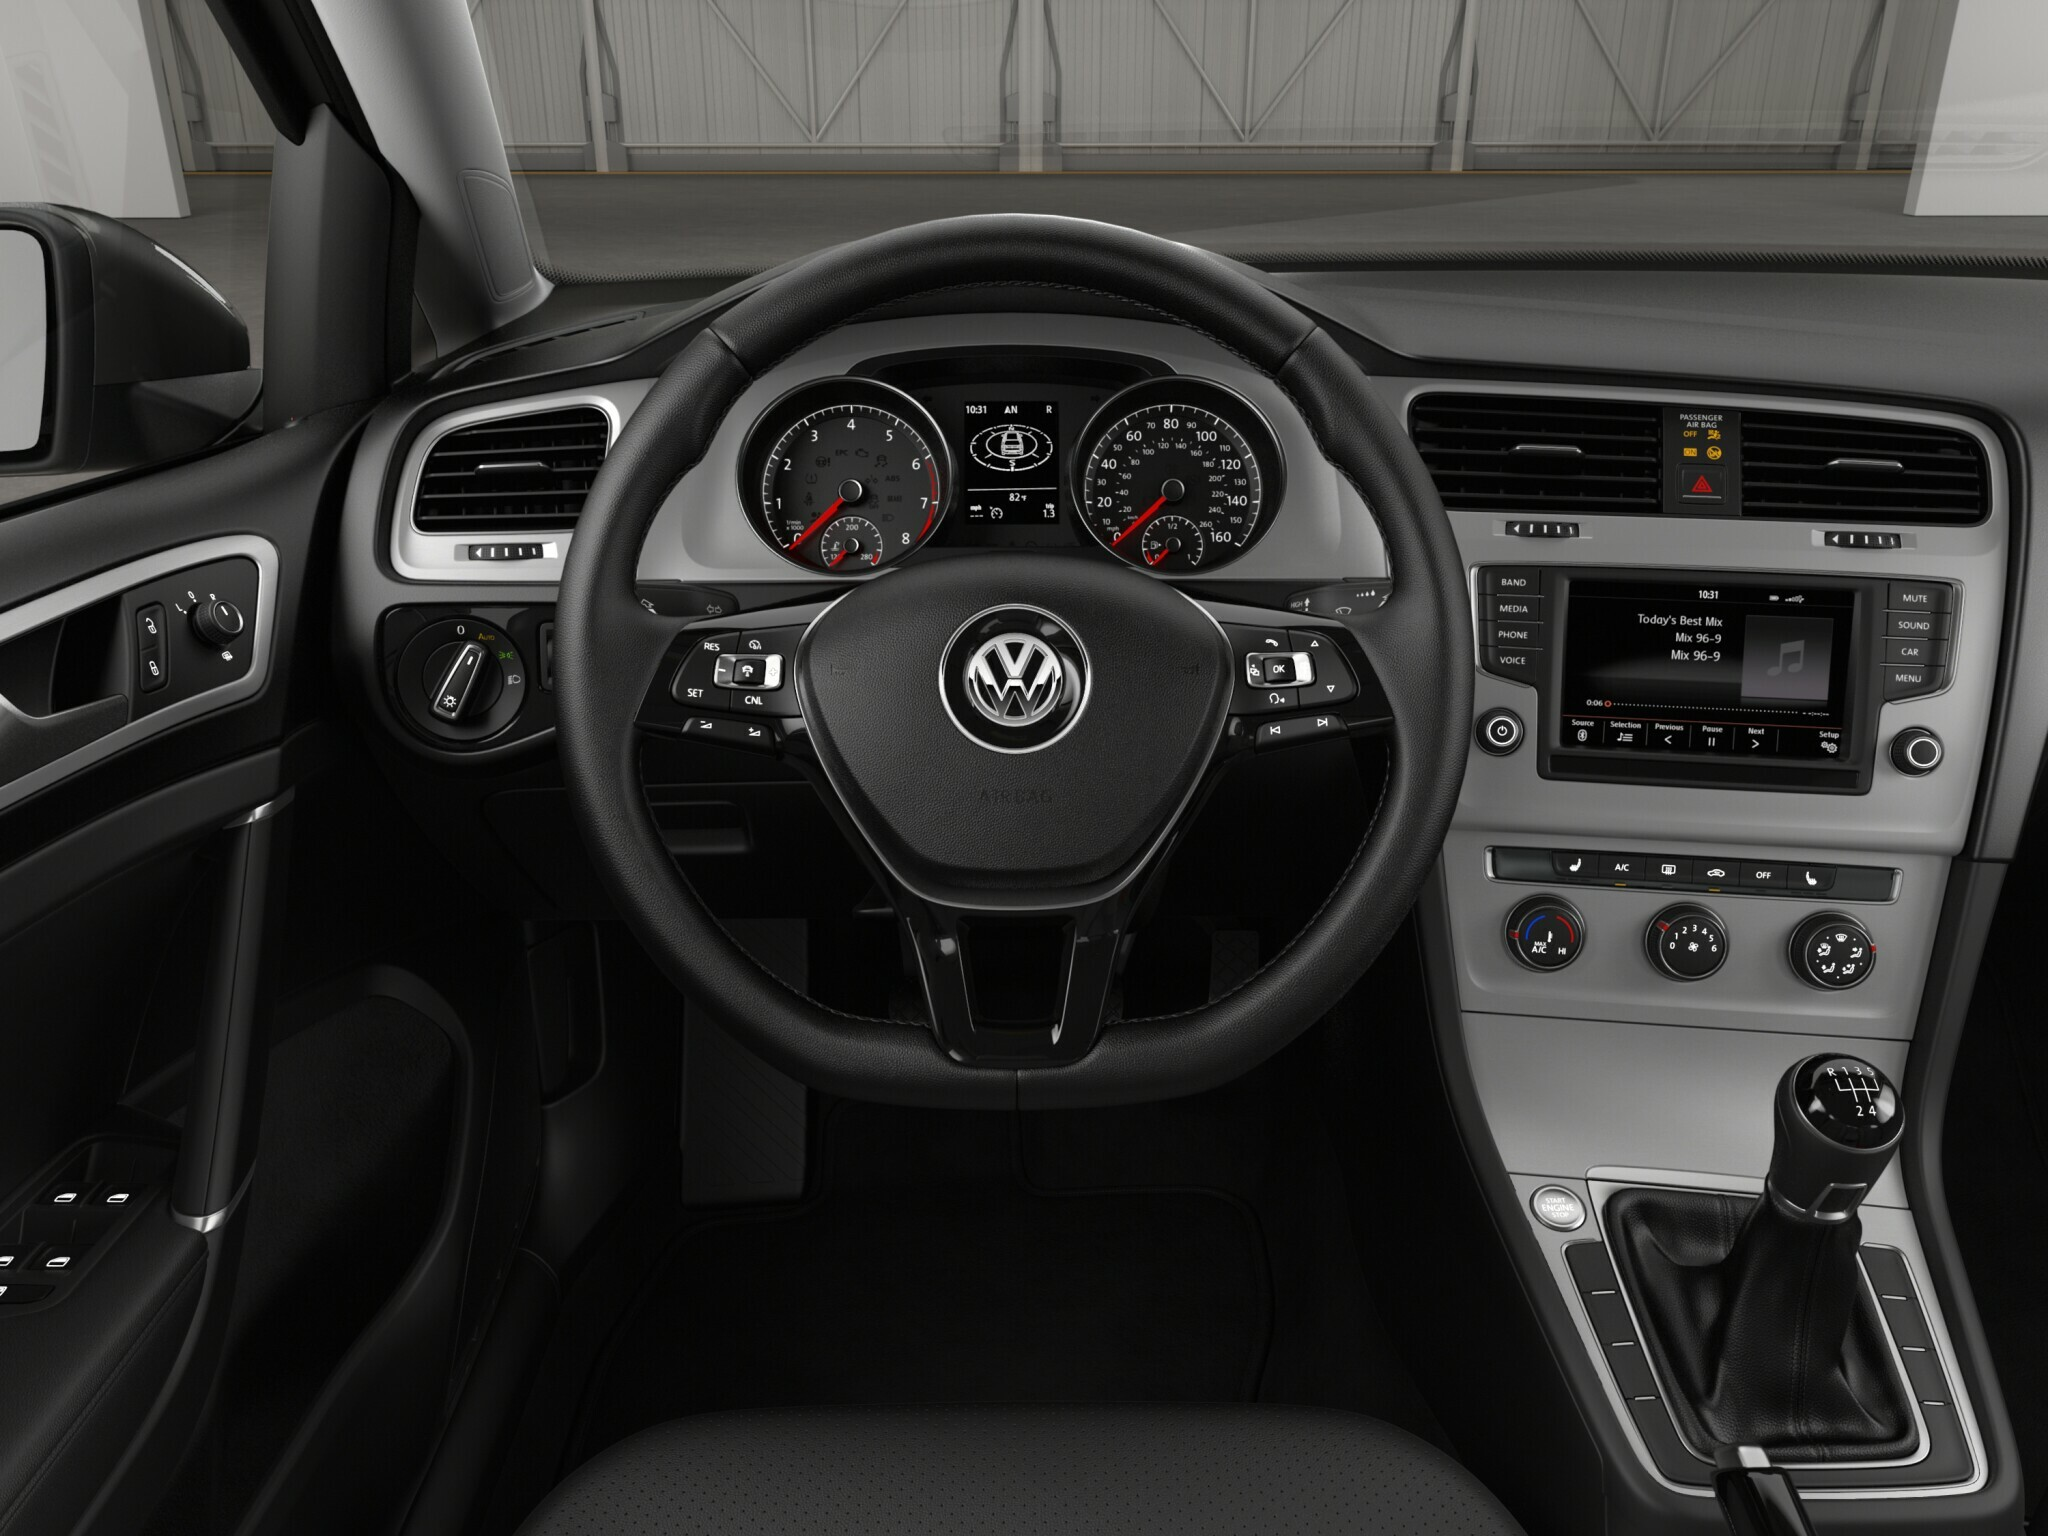 2017 volkswagen passat interior best new cars for 2018. Black Bedroom Furniture Sets. Home Design Ideas